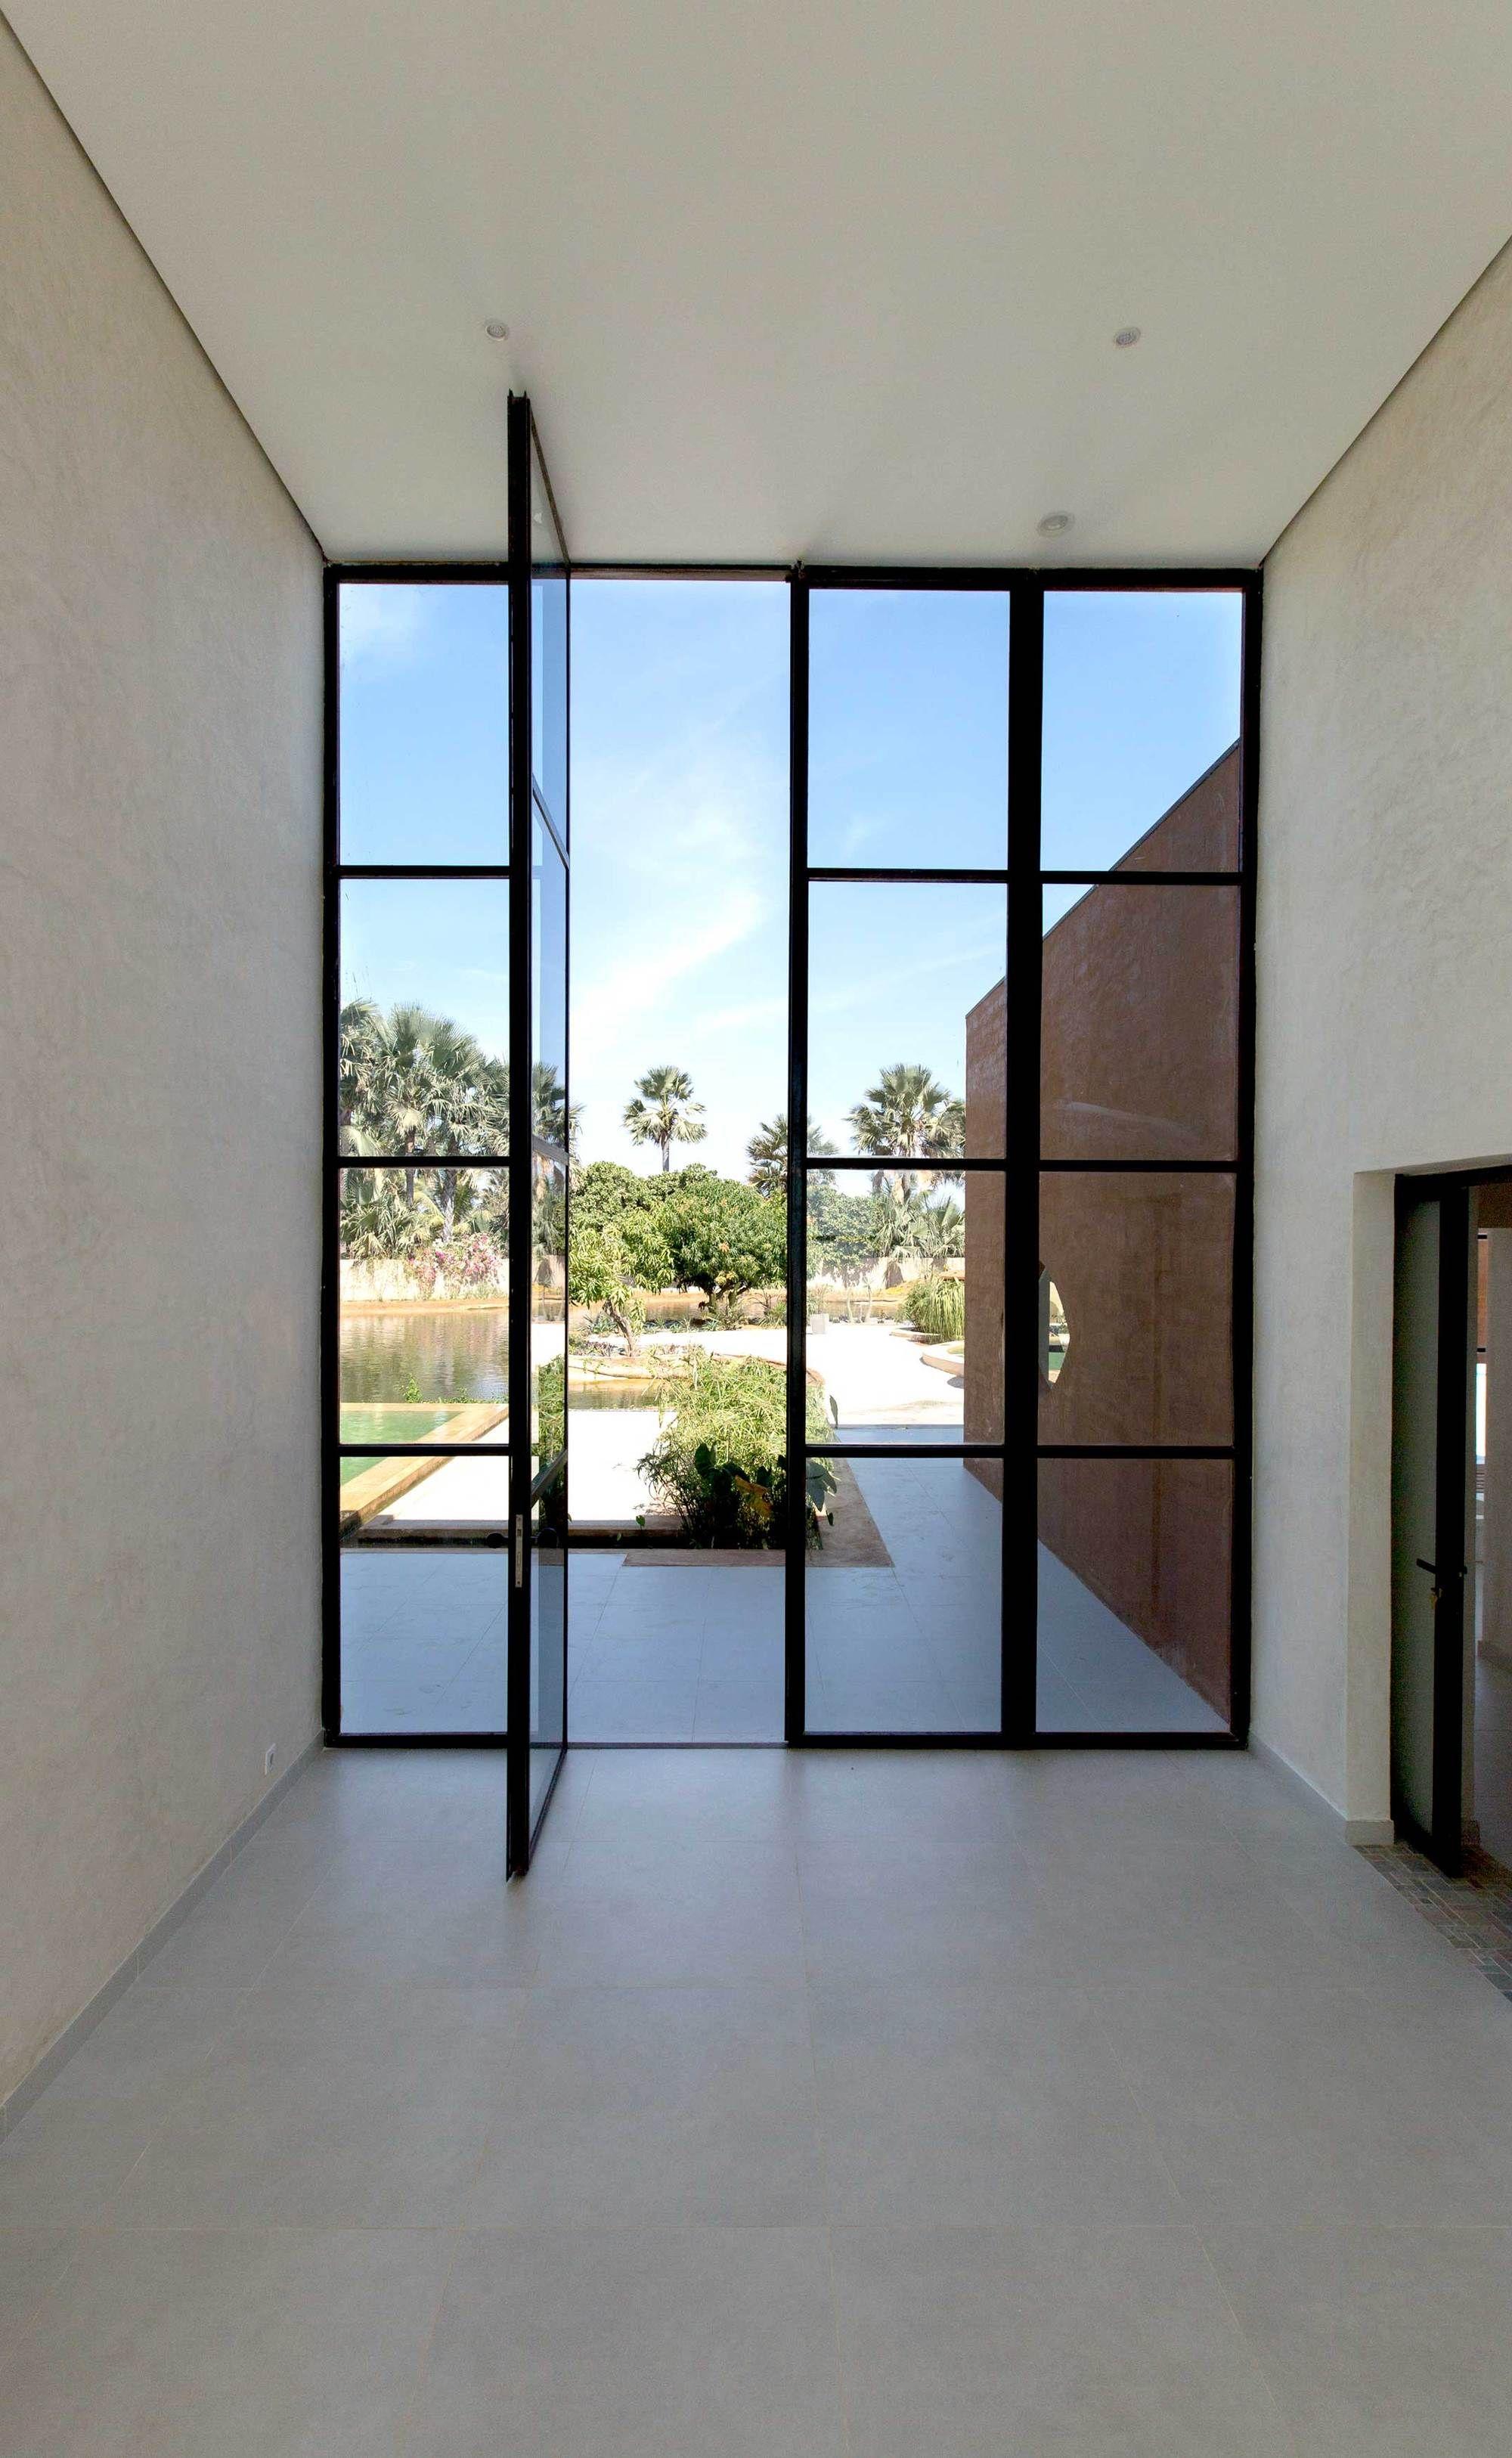 Galer a de casa khamsa atelier koe 14 interior for Casa rural minimalista